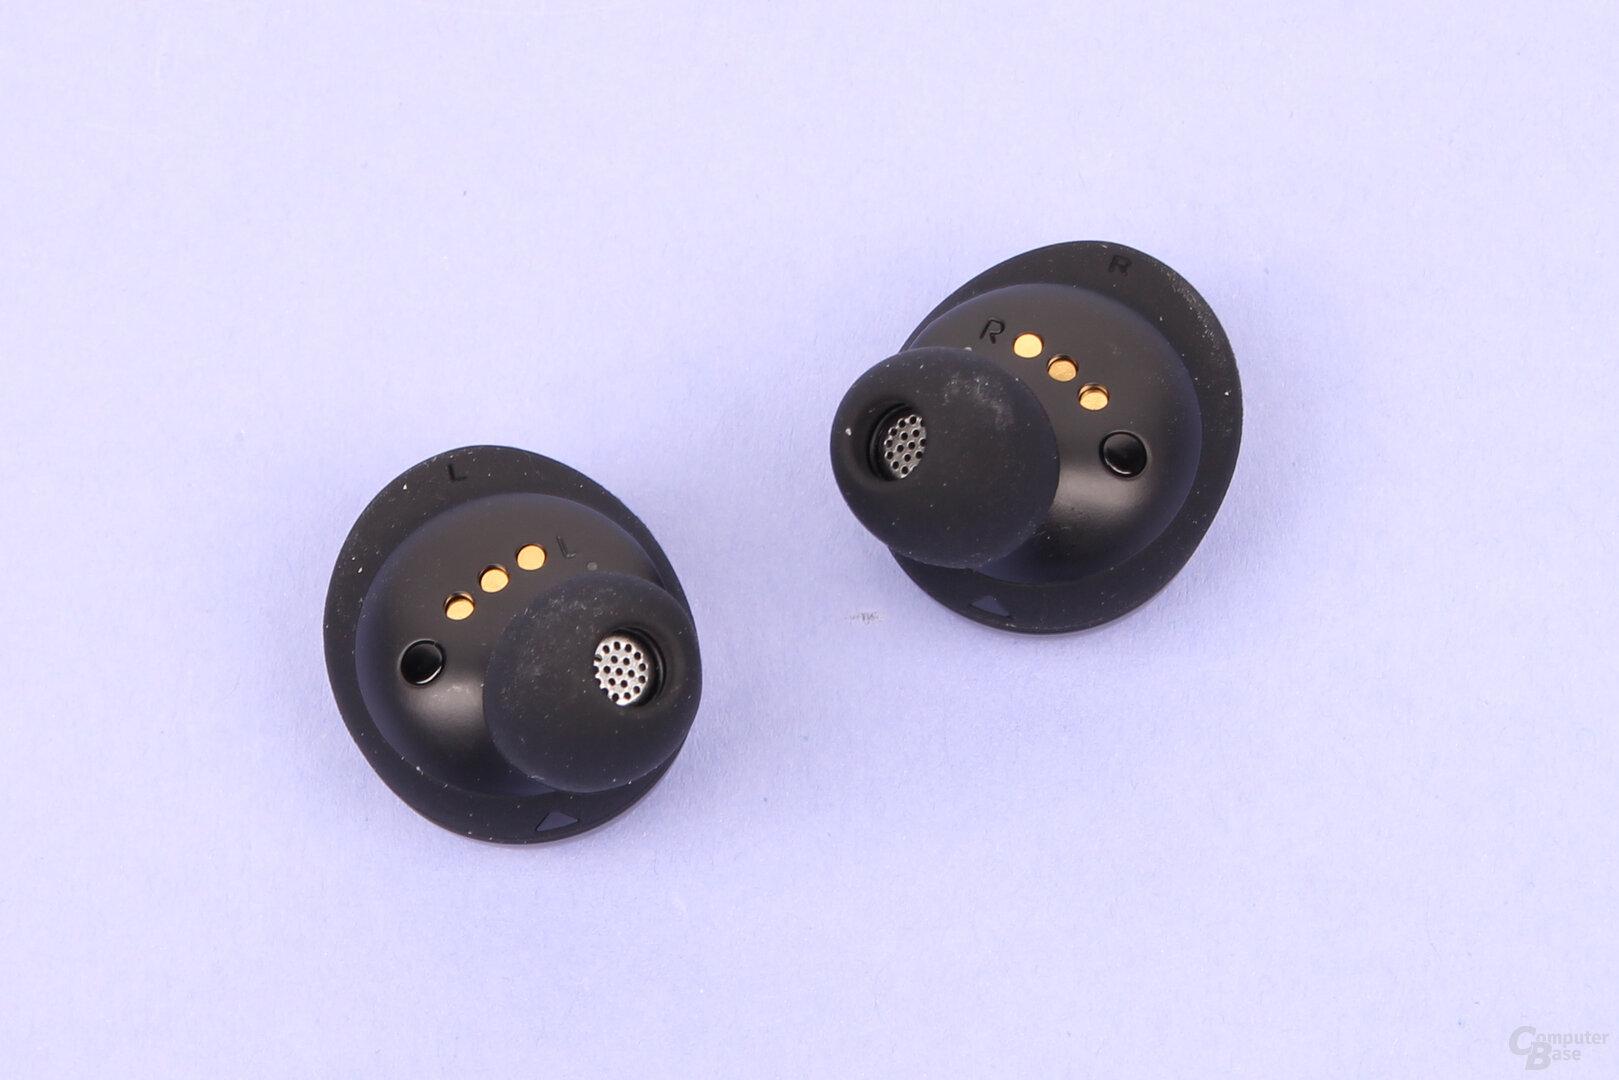 JBL Live Free NC+: Sensoren für Auto-Play/Pause an den Ohrhörern